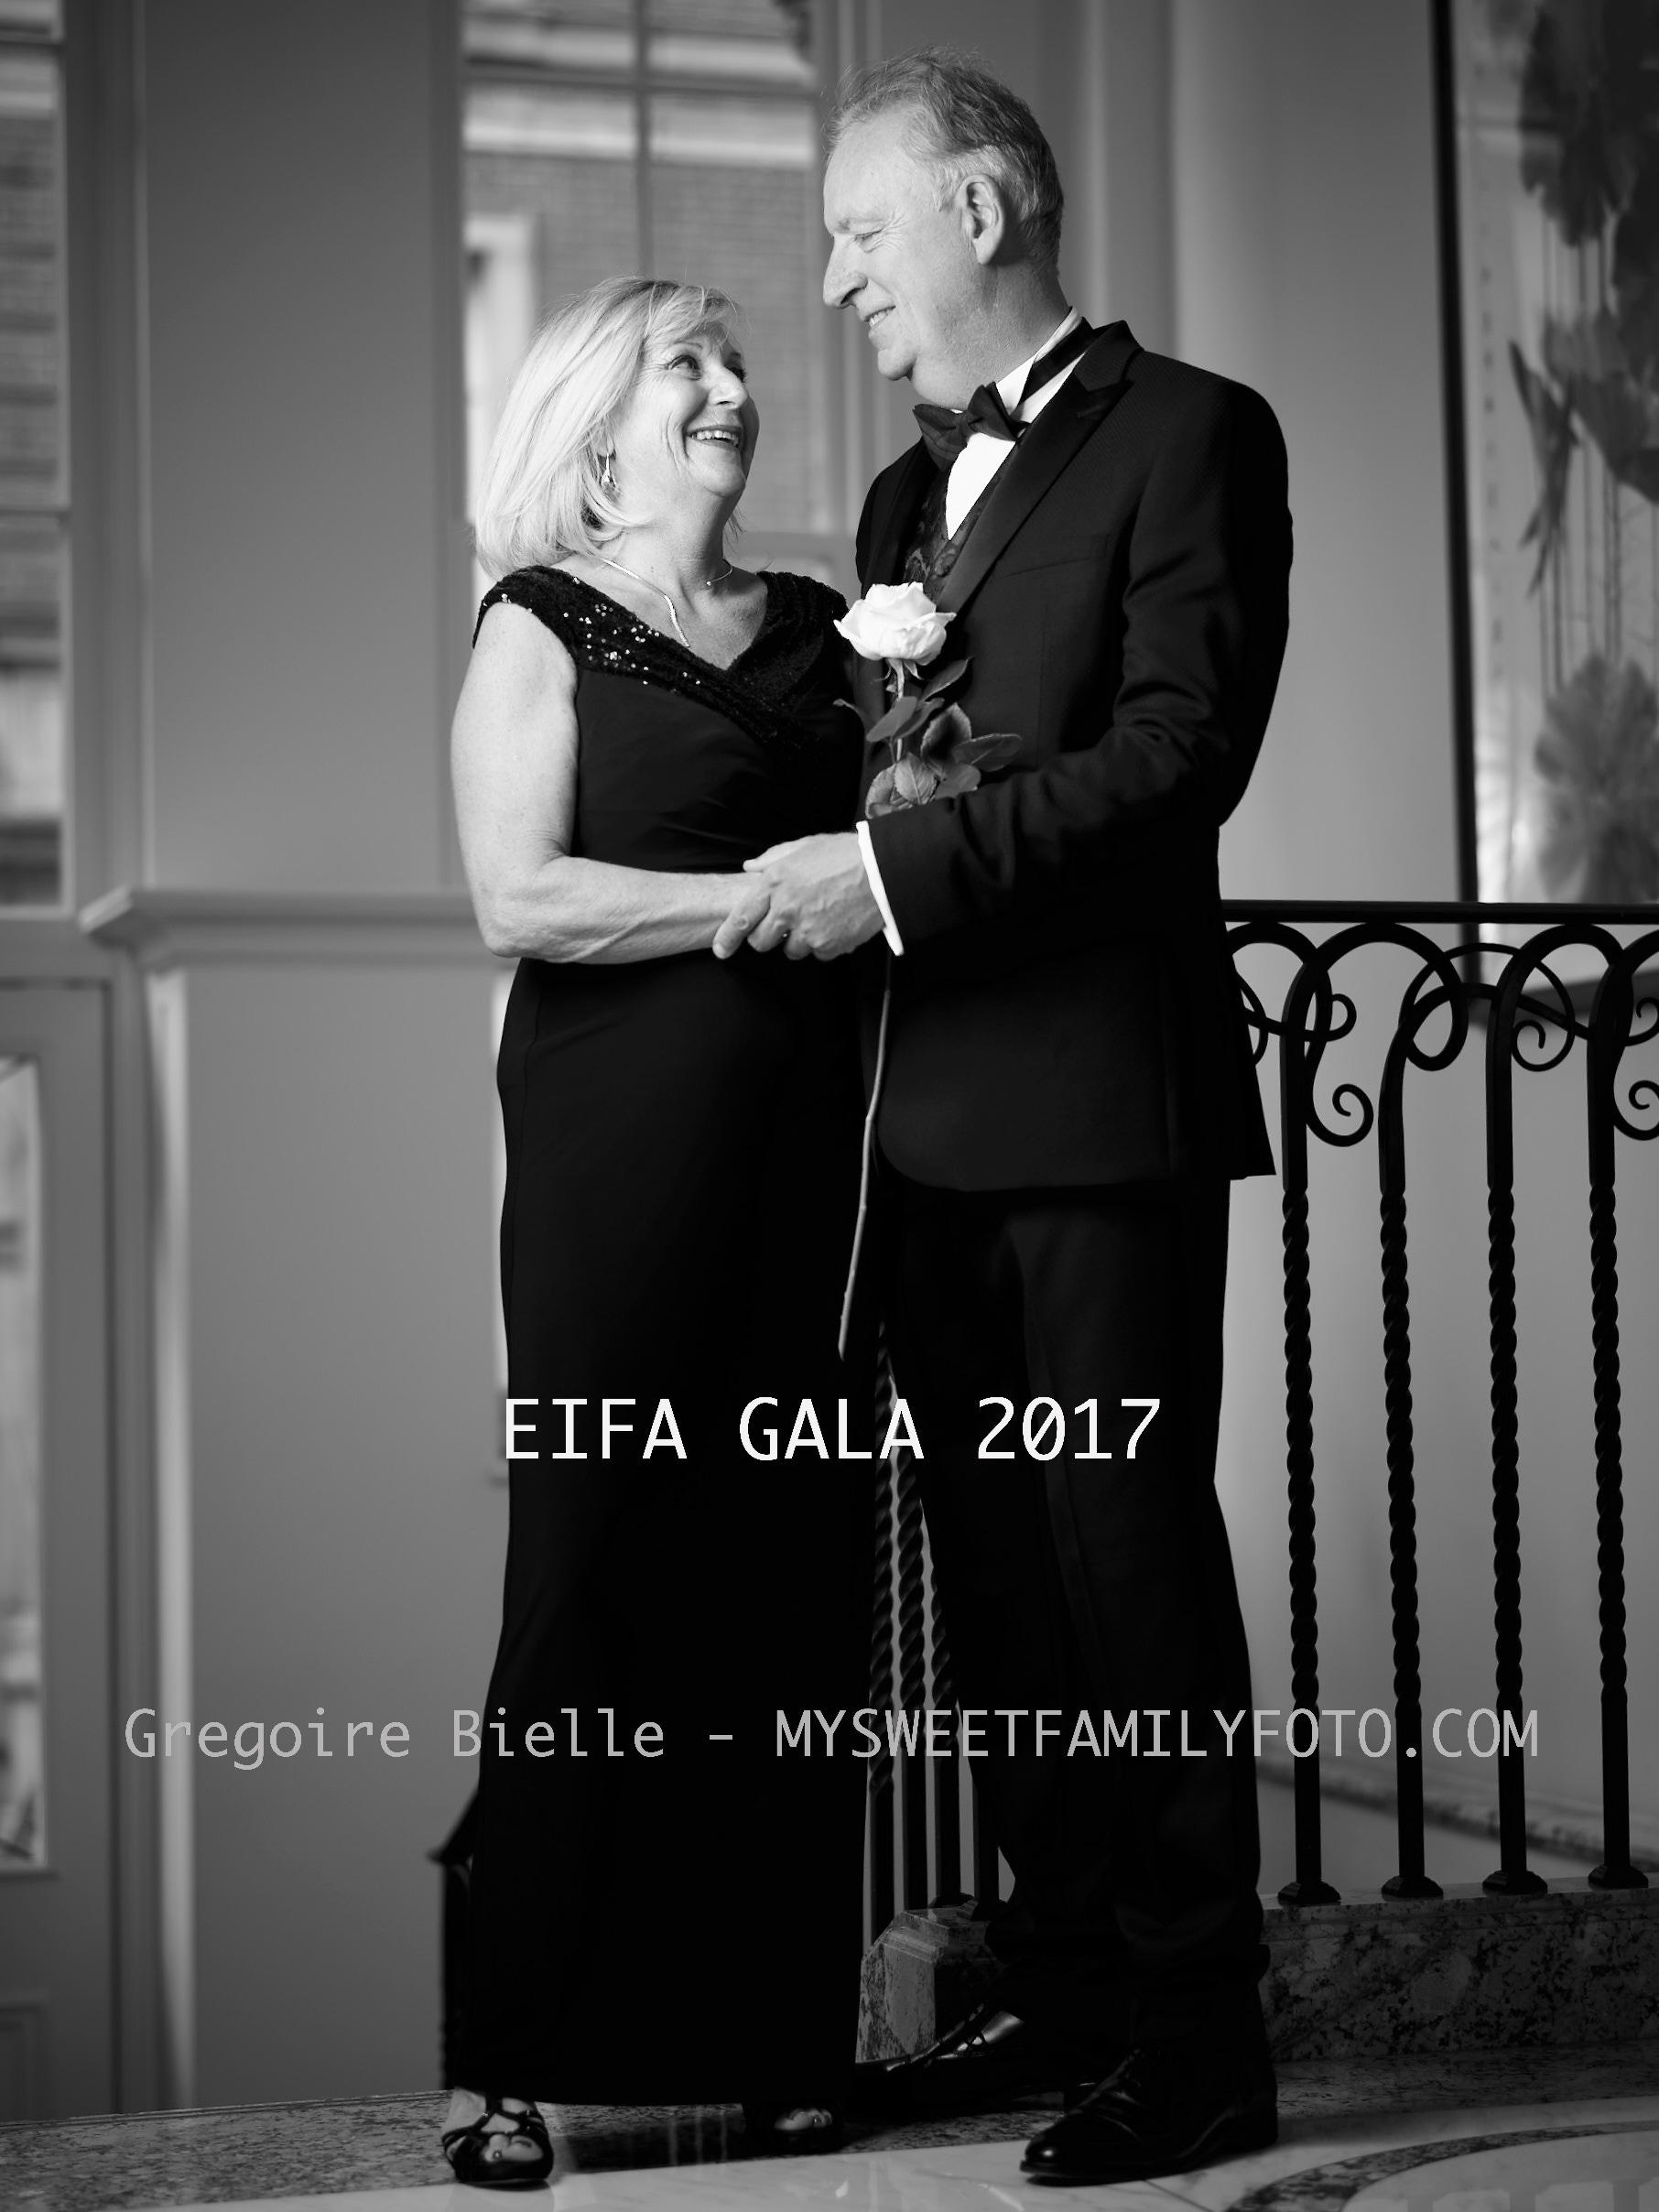 EIFA GALA 1003.jpg